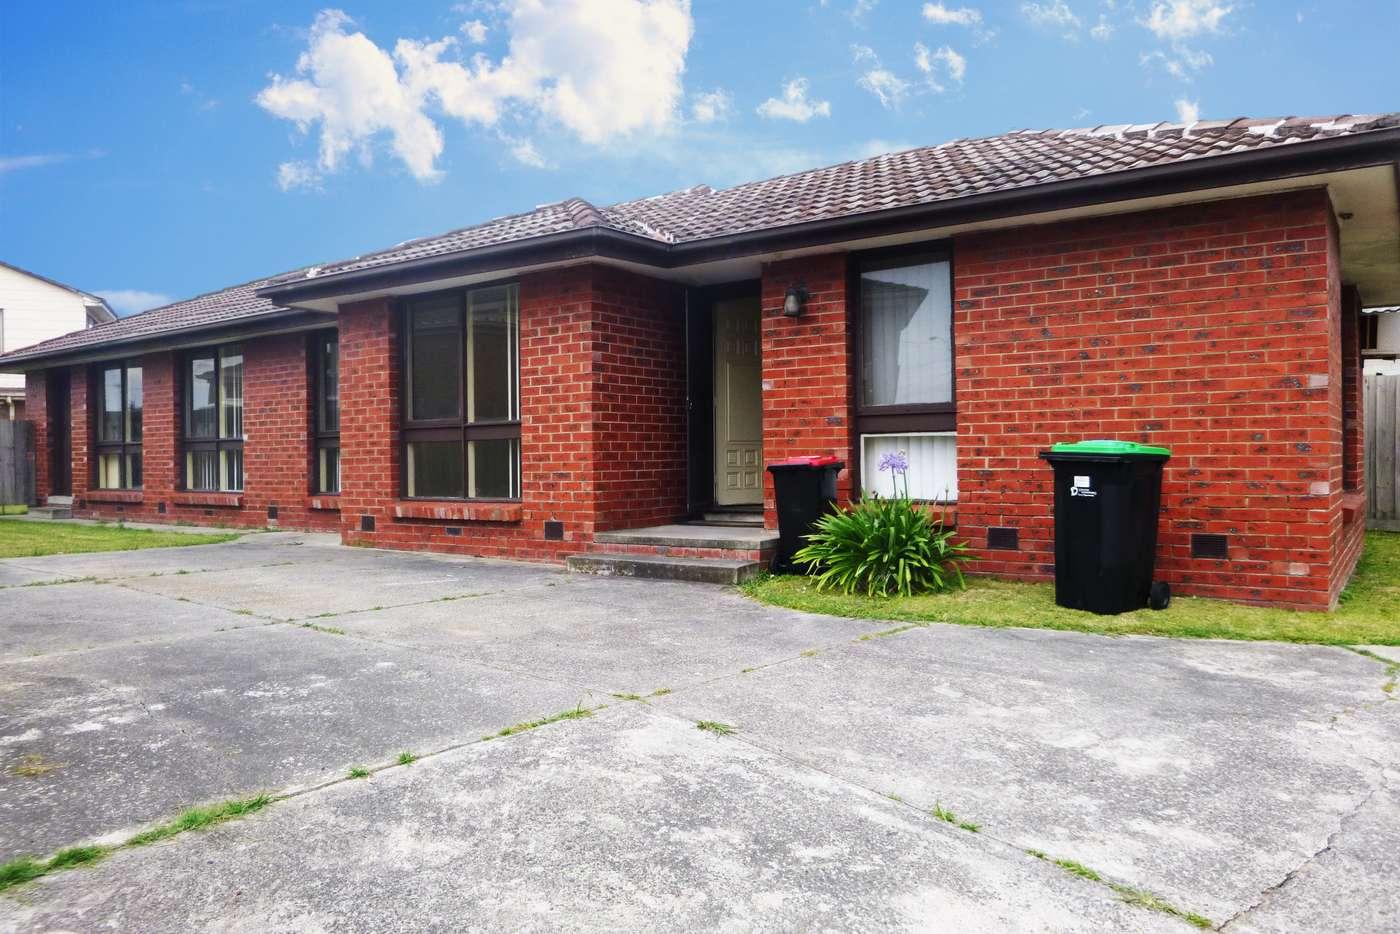 Main view of Homely house listing, 115 Kingsclere Avenue, Keysborough VIC 3173